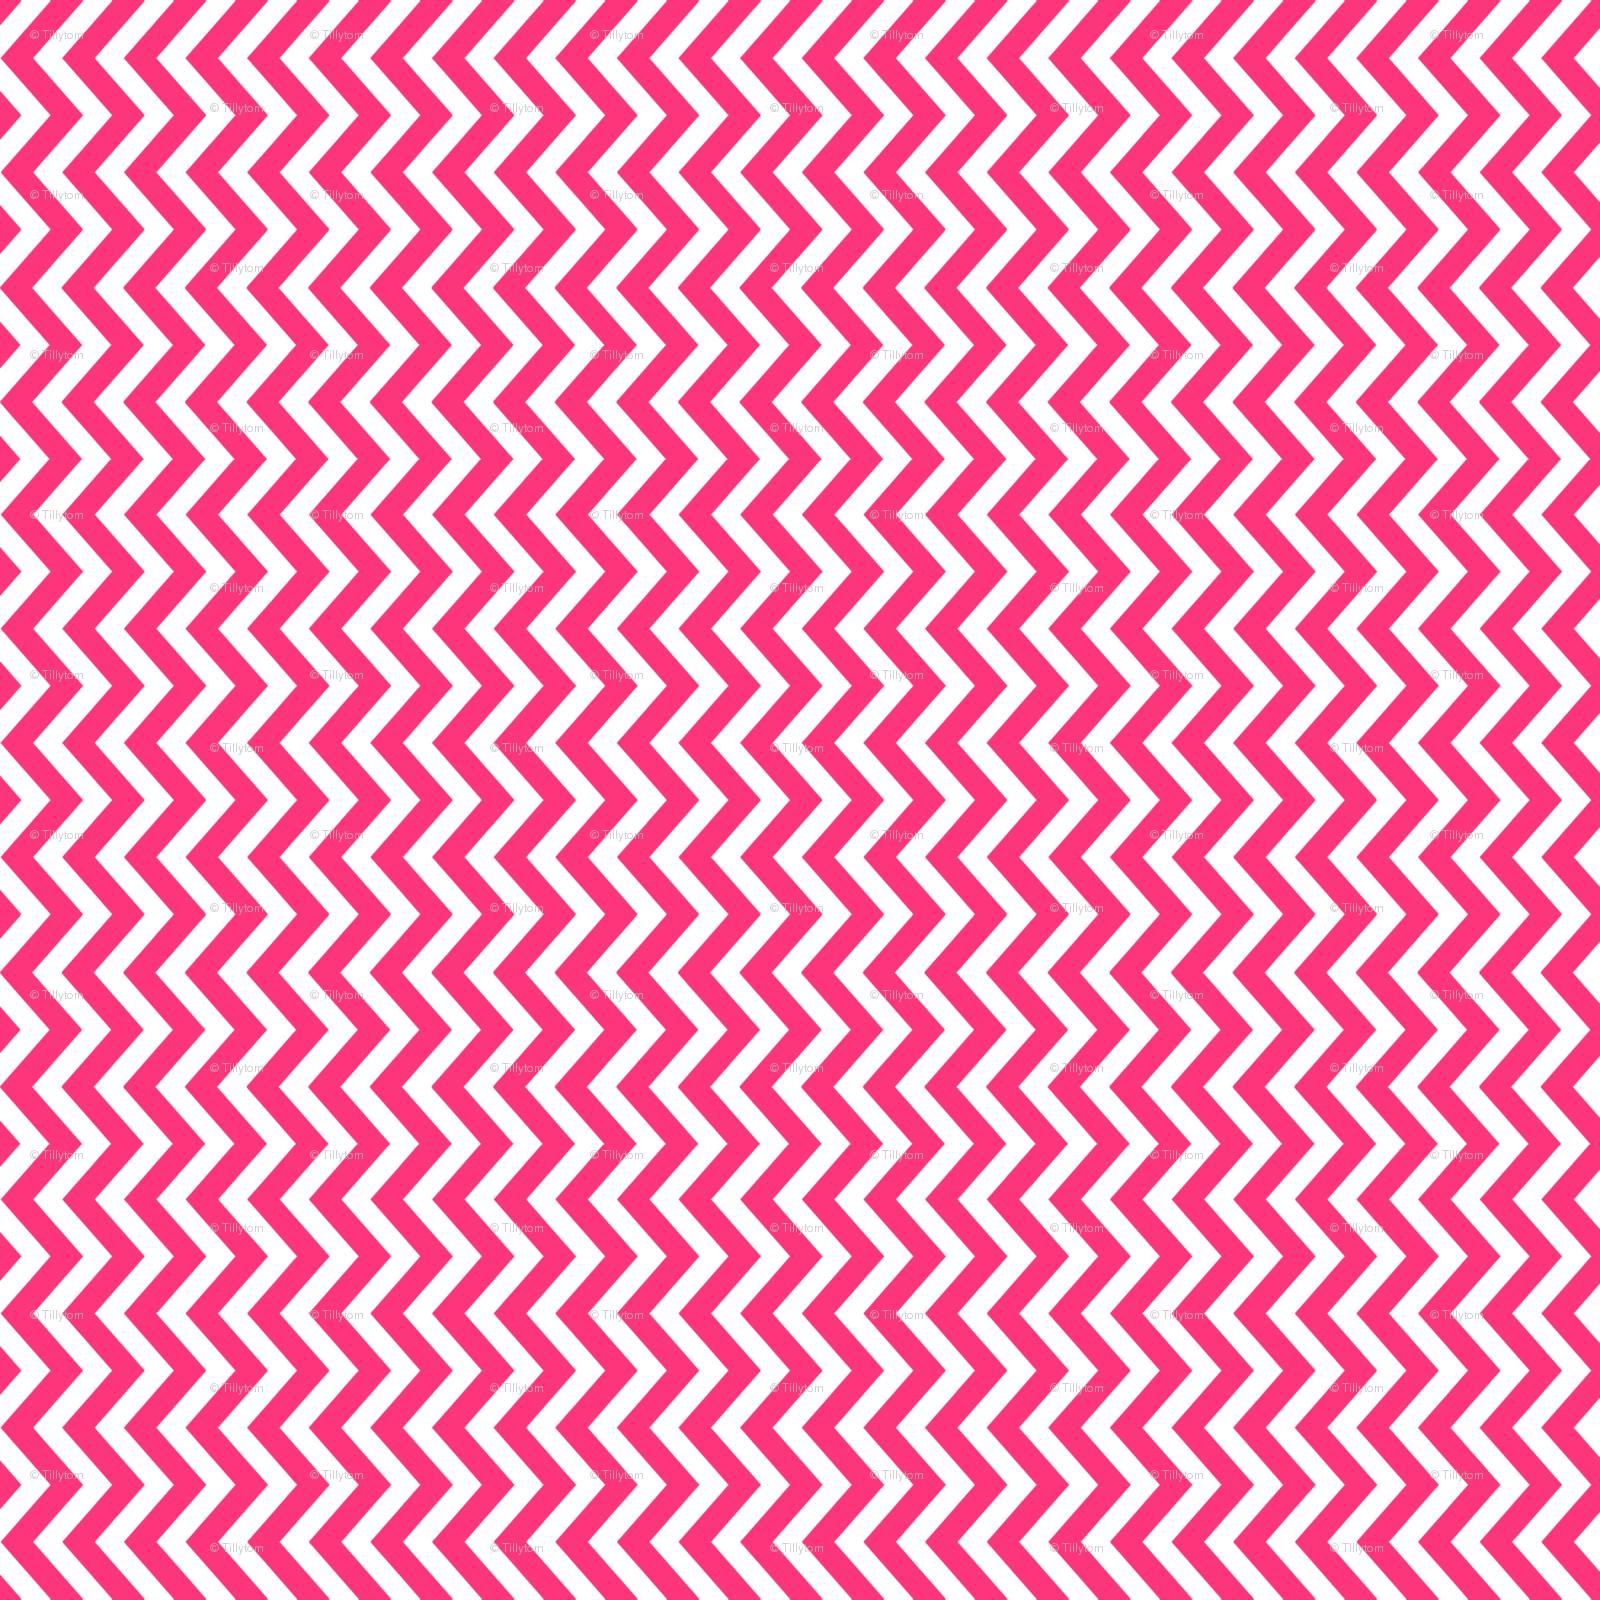 Pink Chevron Background Rjune 2012 chevron hot pink 1600x1600